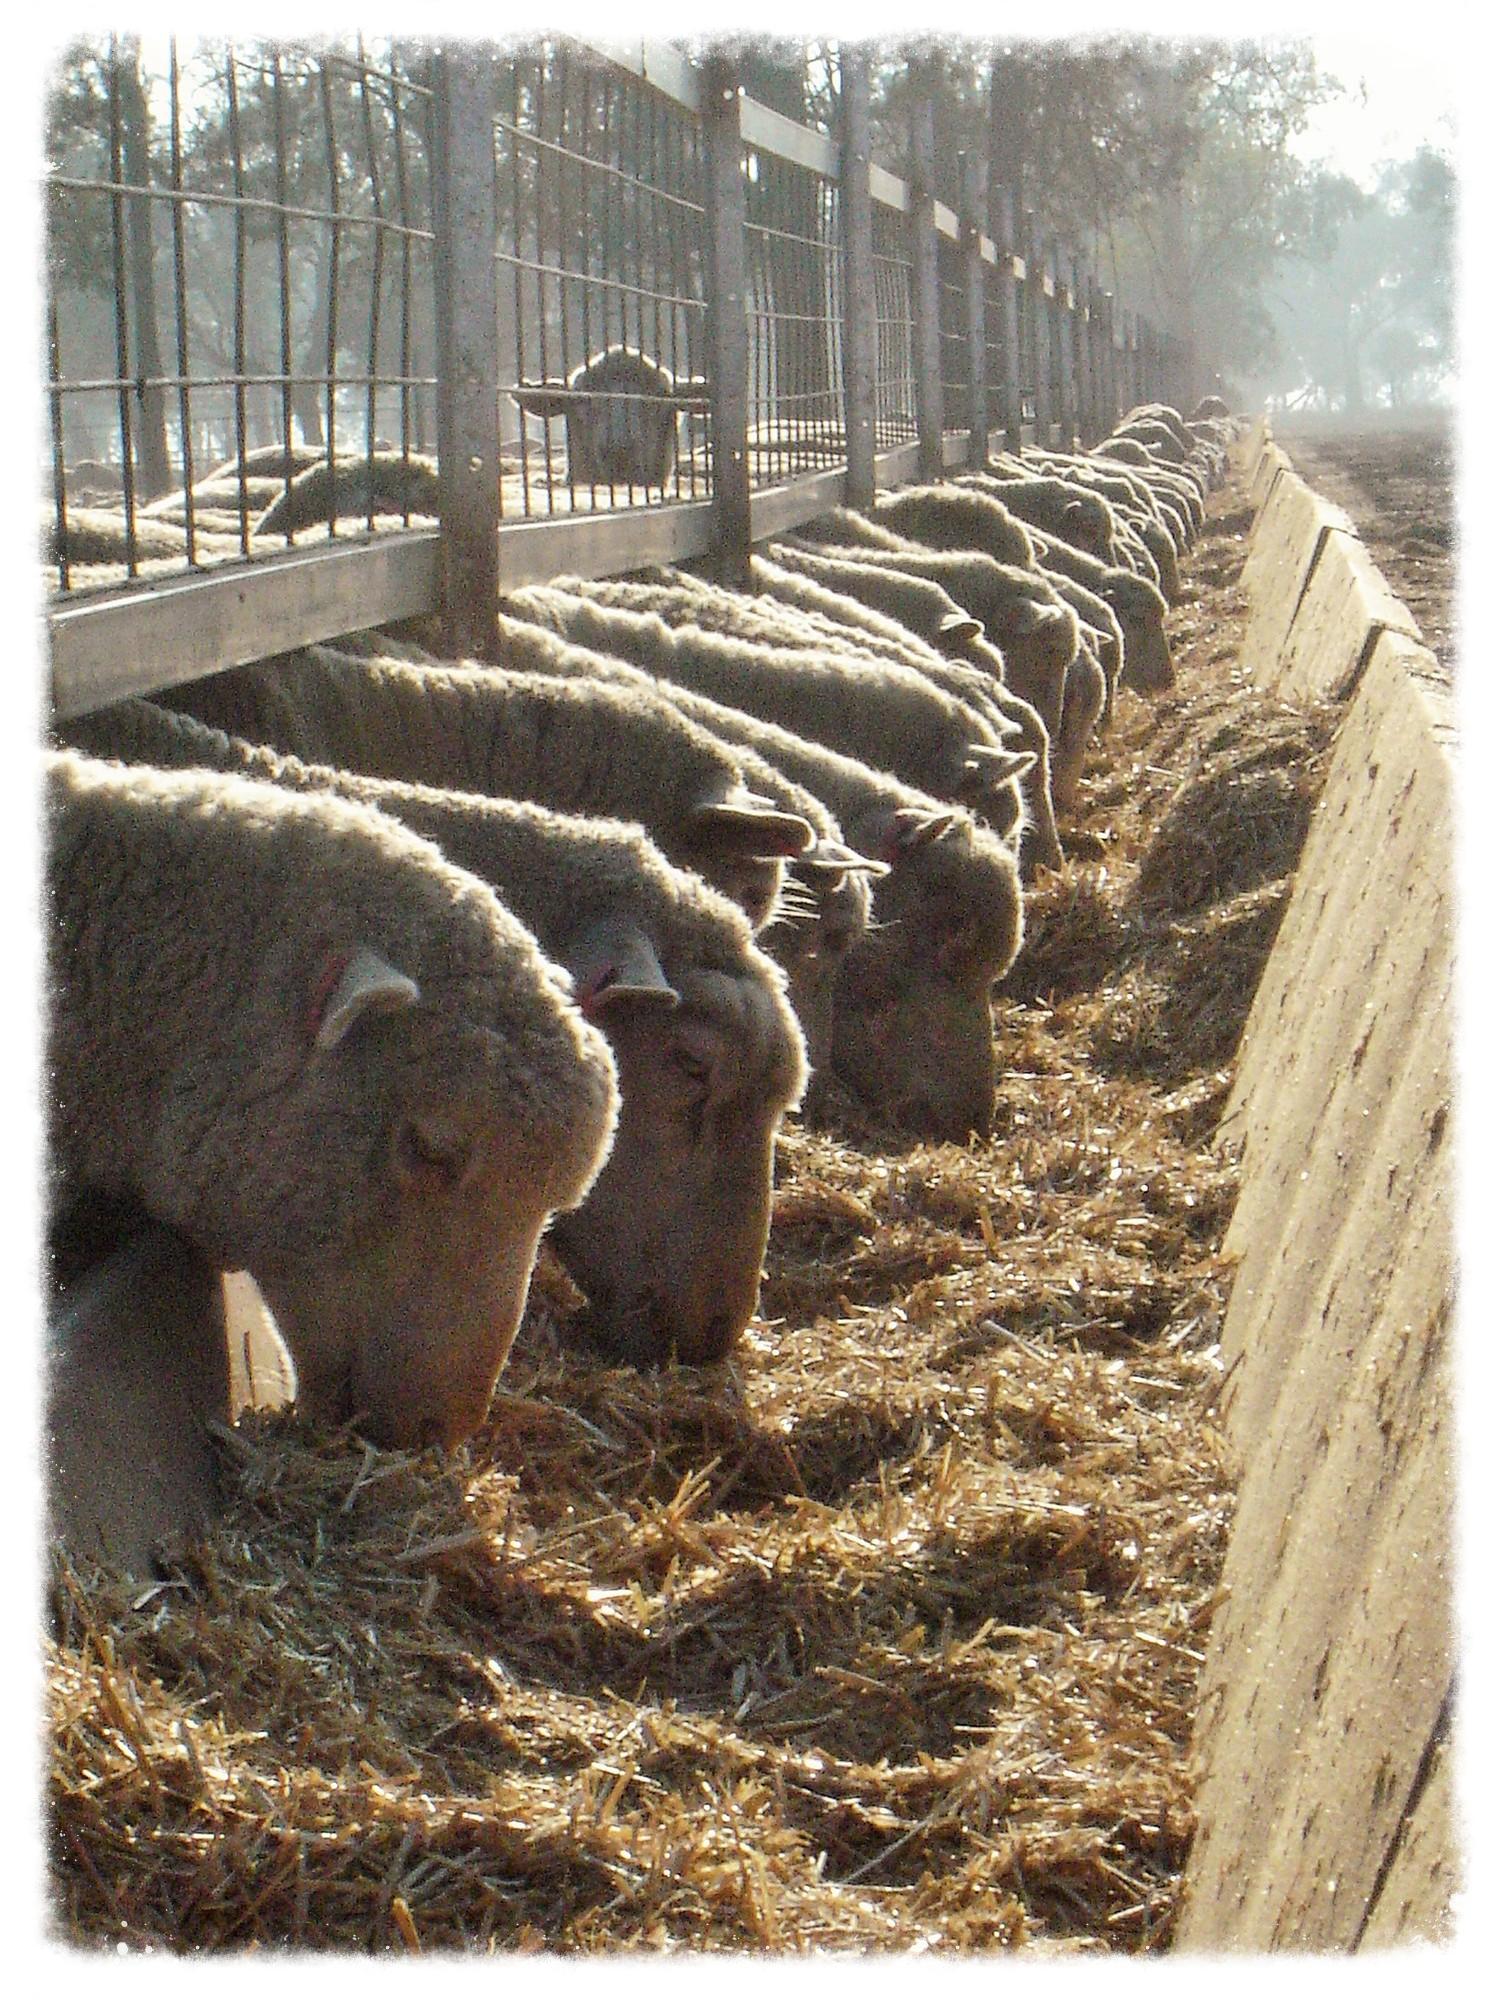 Lamb feedlot